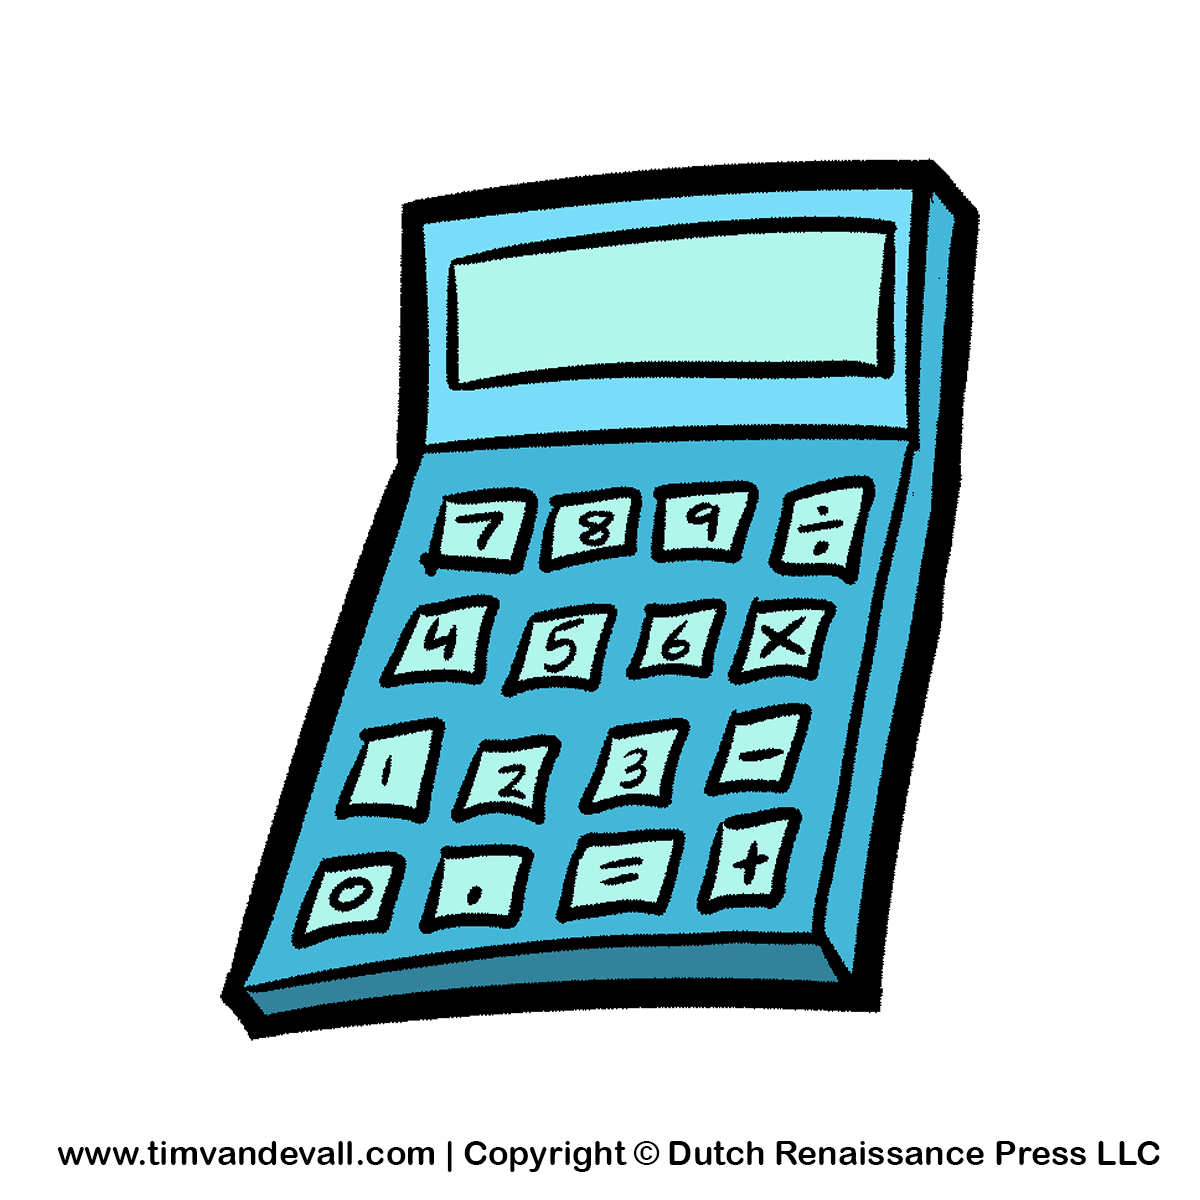 Calculator Clipart-Calculator Clipart-10